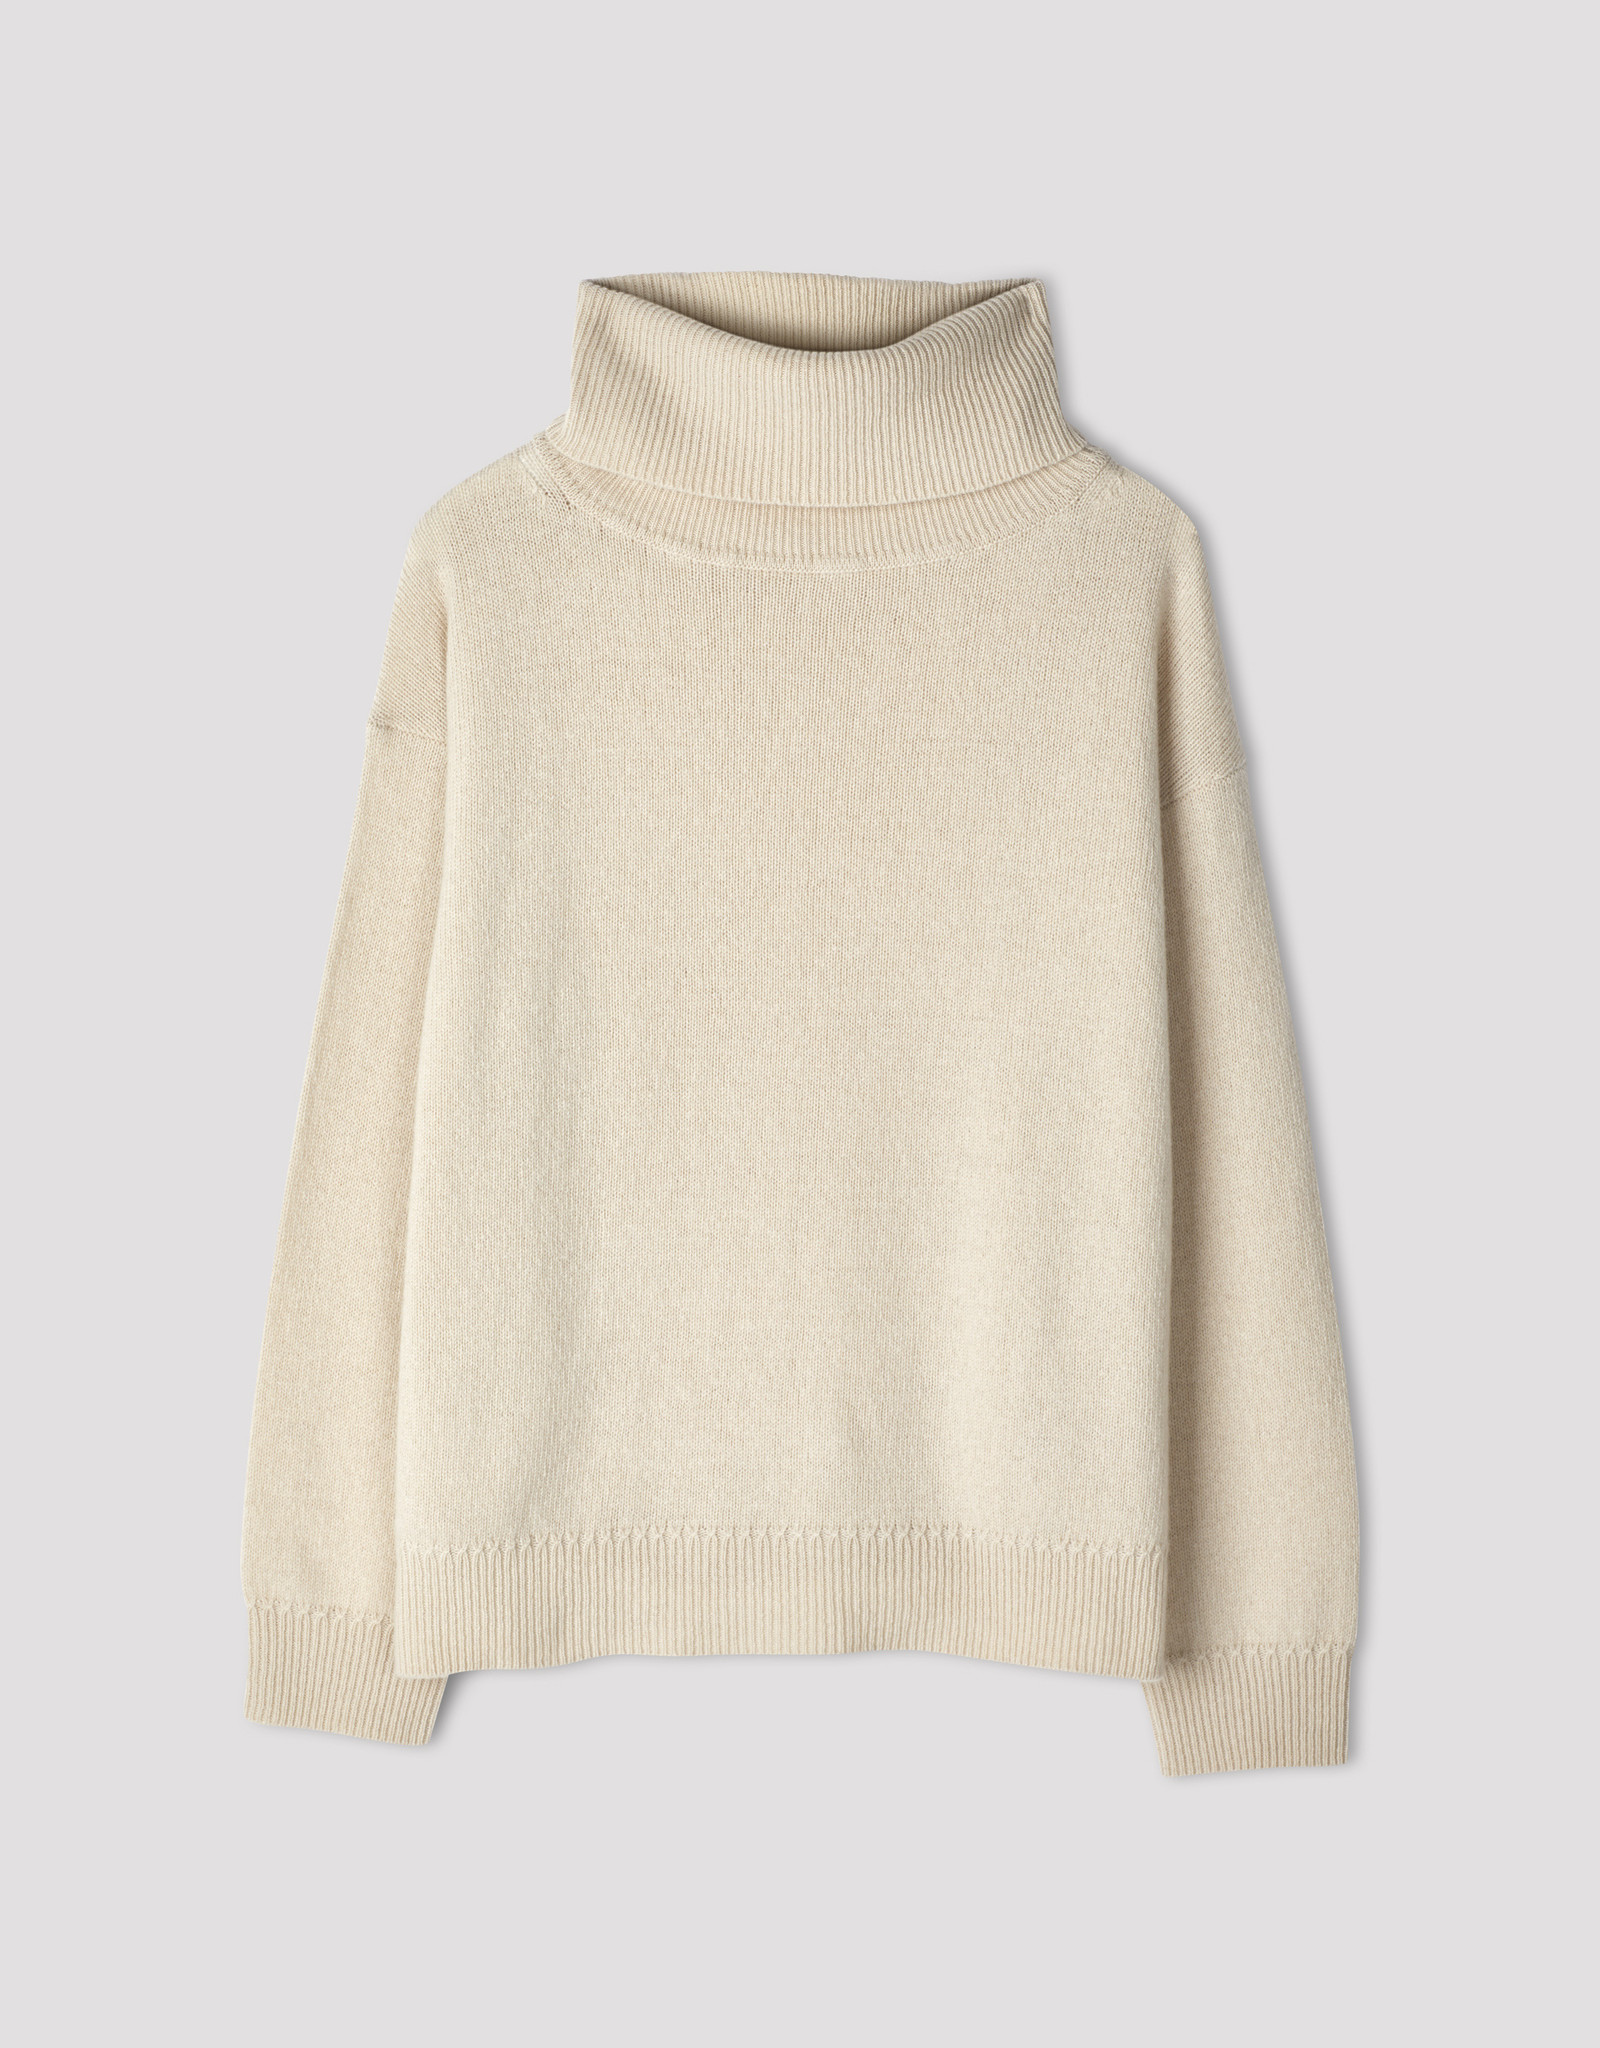 Filippa K Molly Roll-Neck Sweater